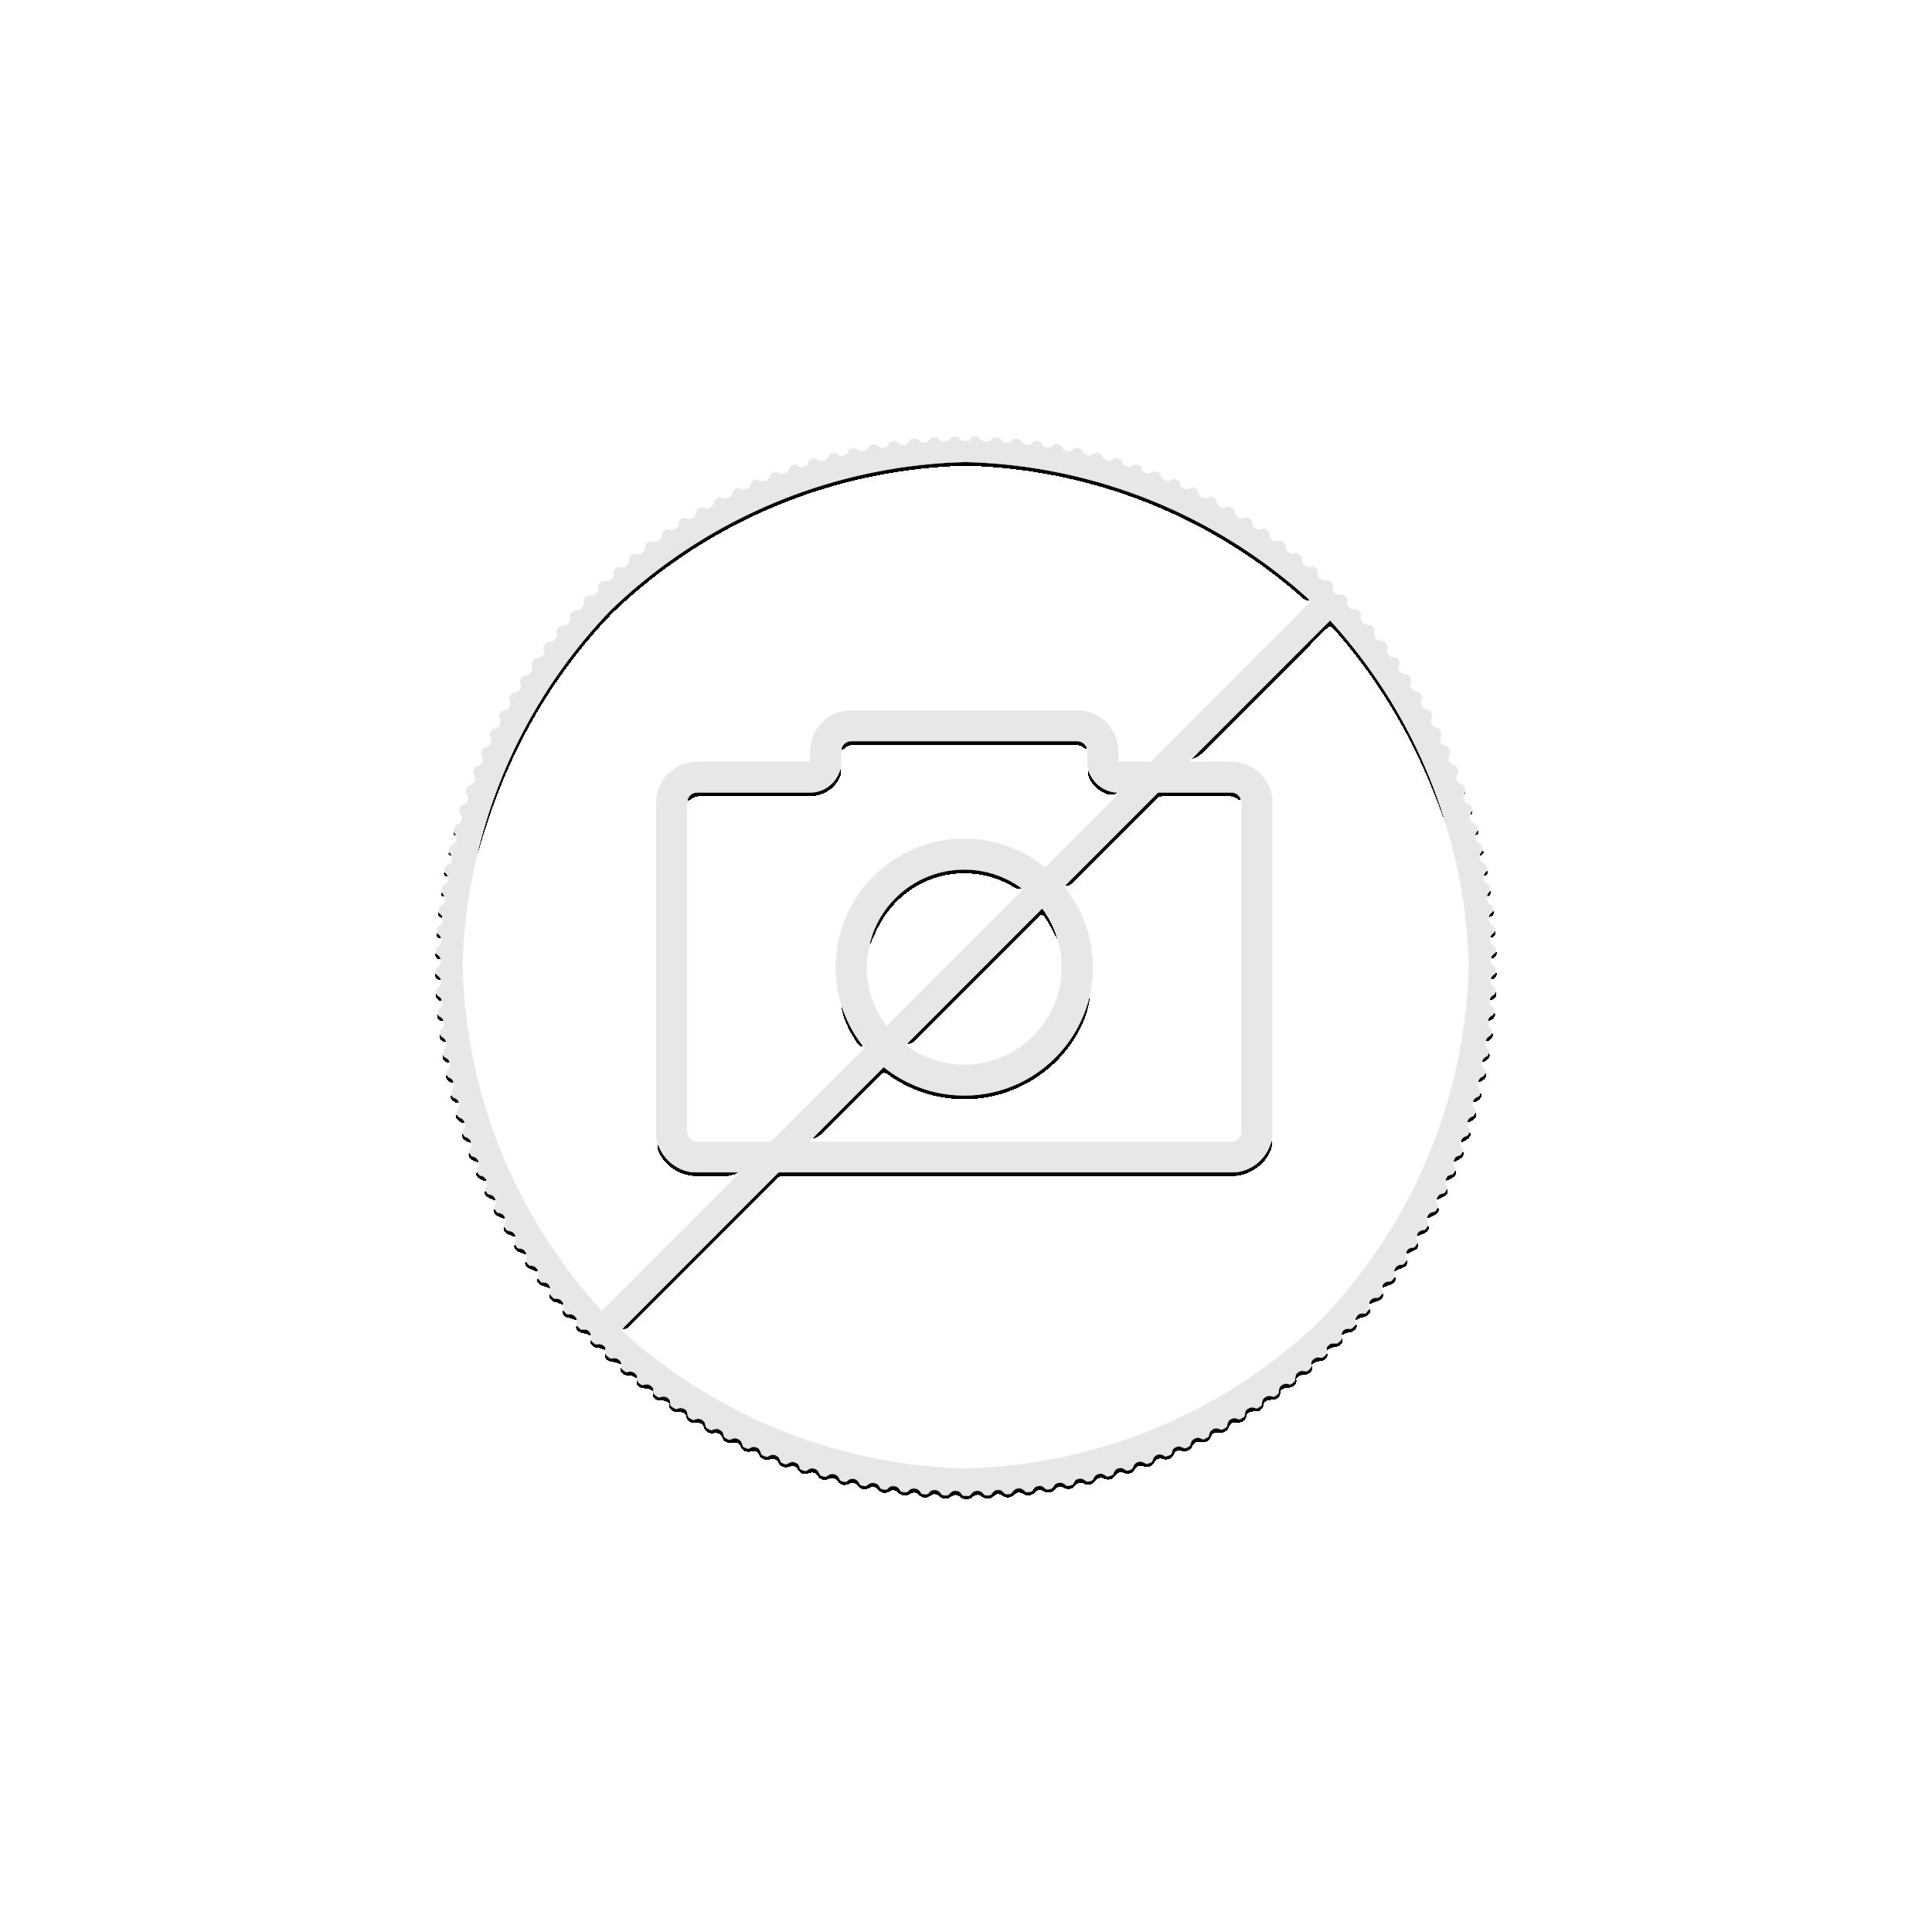 1 troy ounce zilveren munt Love is Precious - Flamingo's 2021 - doos